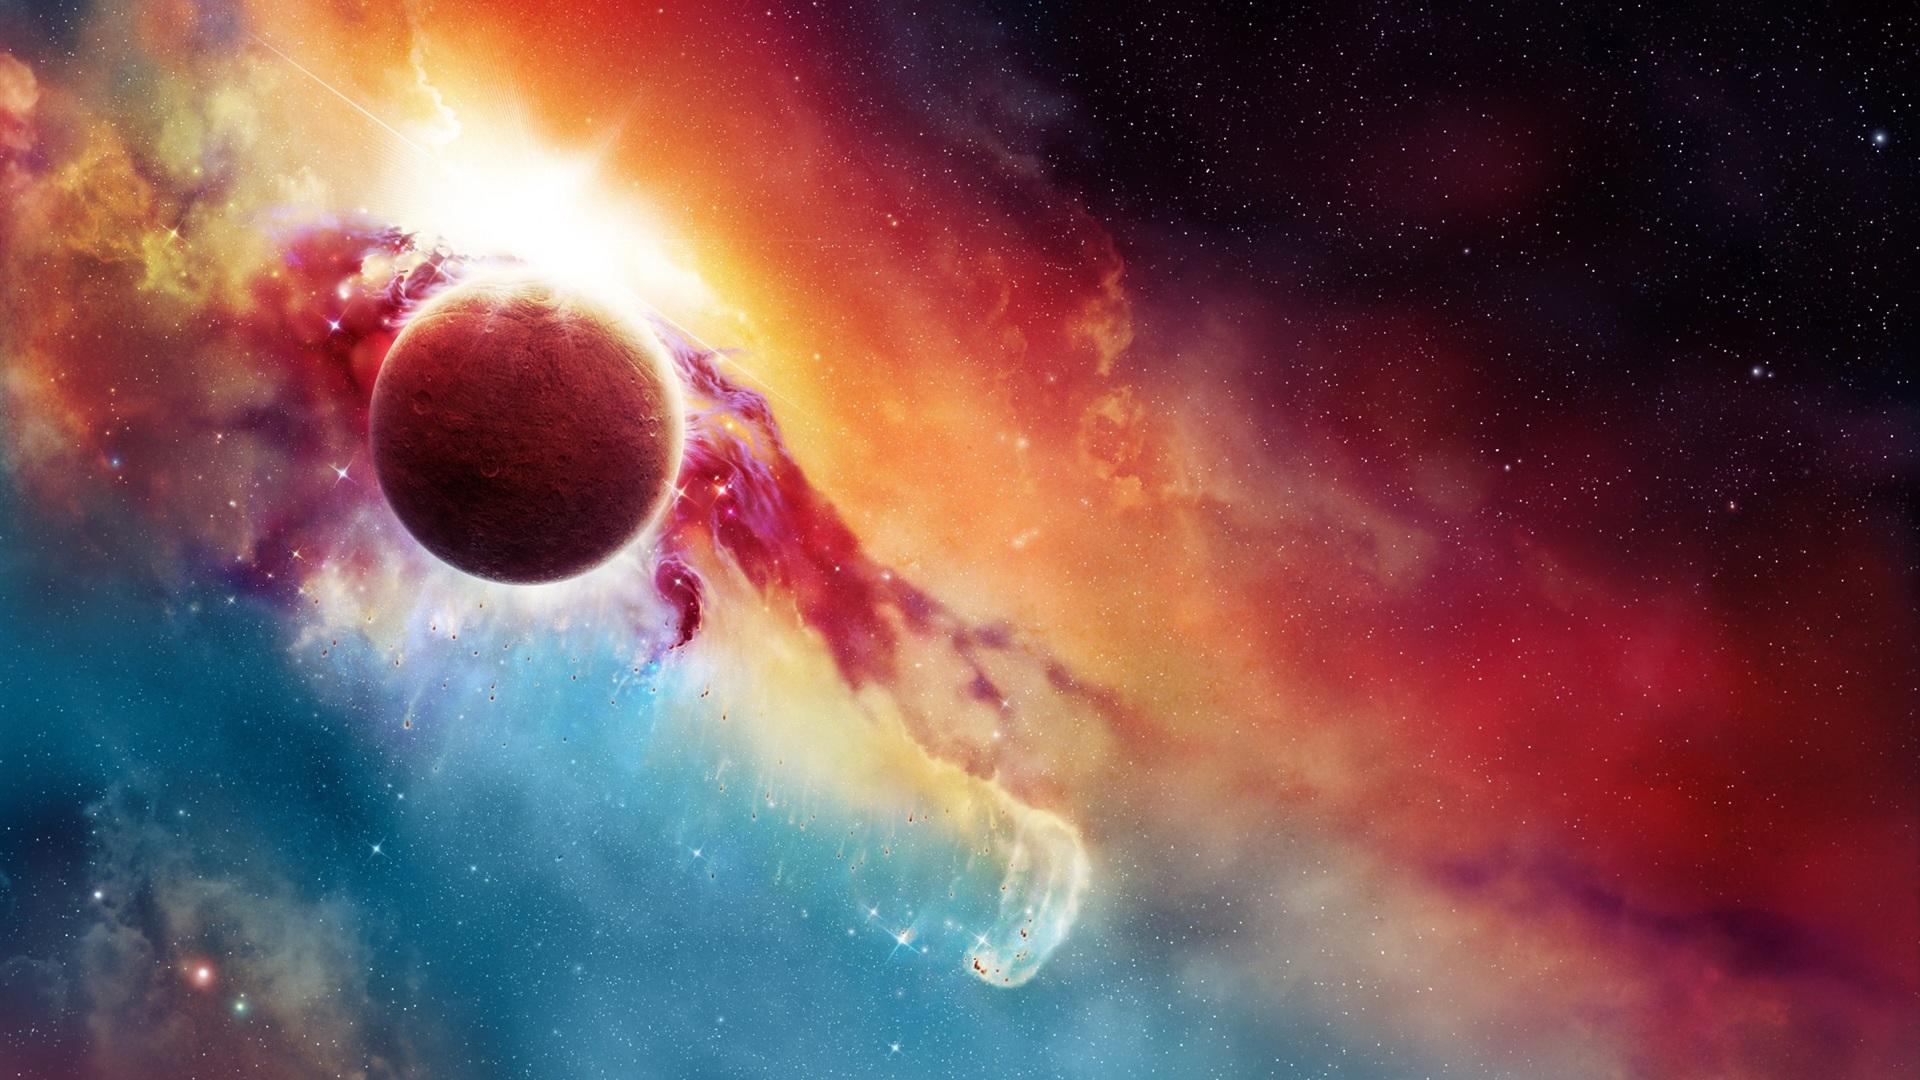 Beauty Hd Galaxy Wallpaper Hintergrundbilder Hd Sternennebel